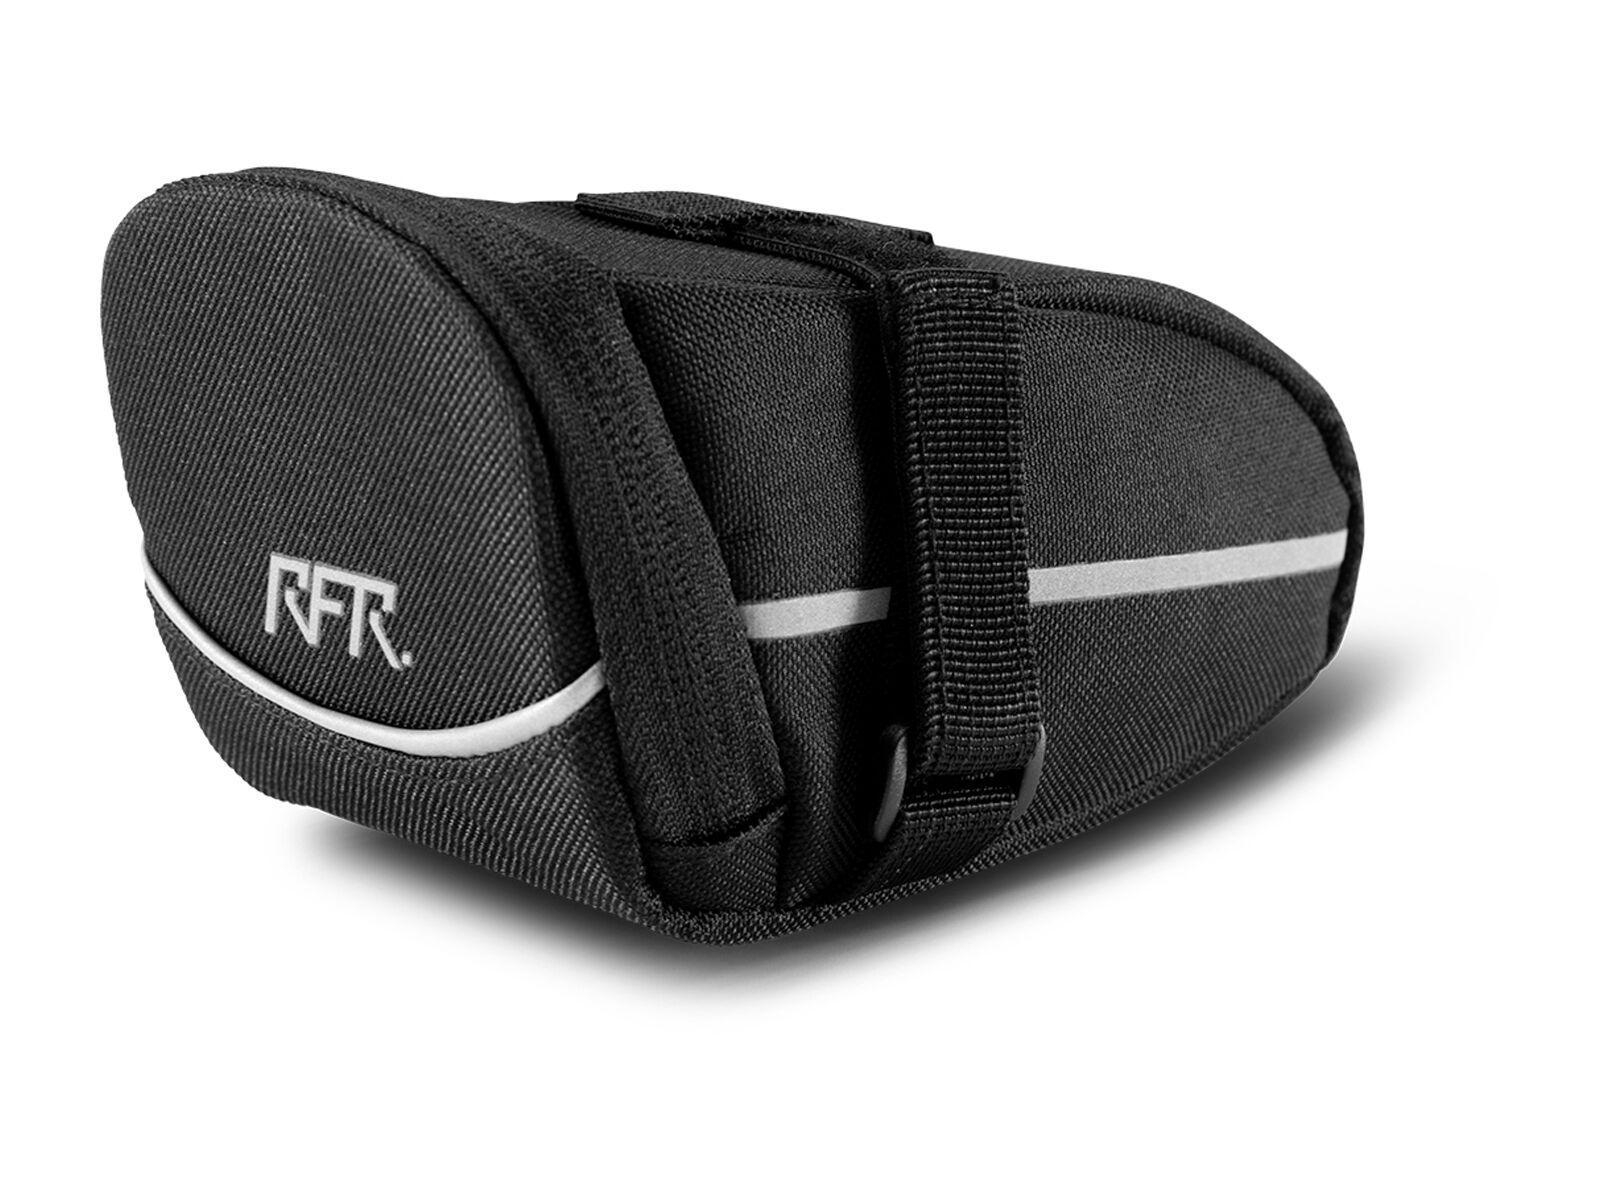 Cube RFR Satteltasche L, black 14079